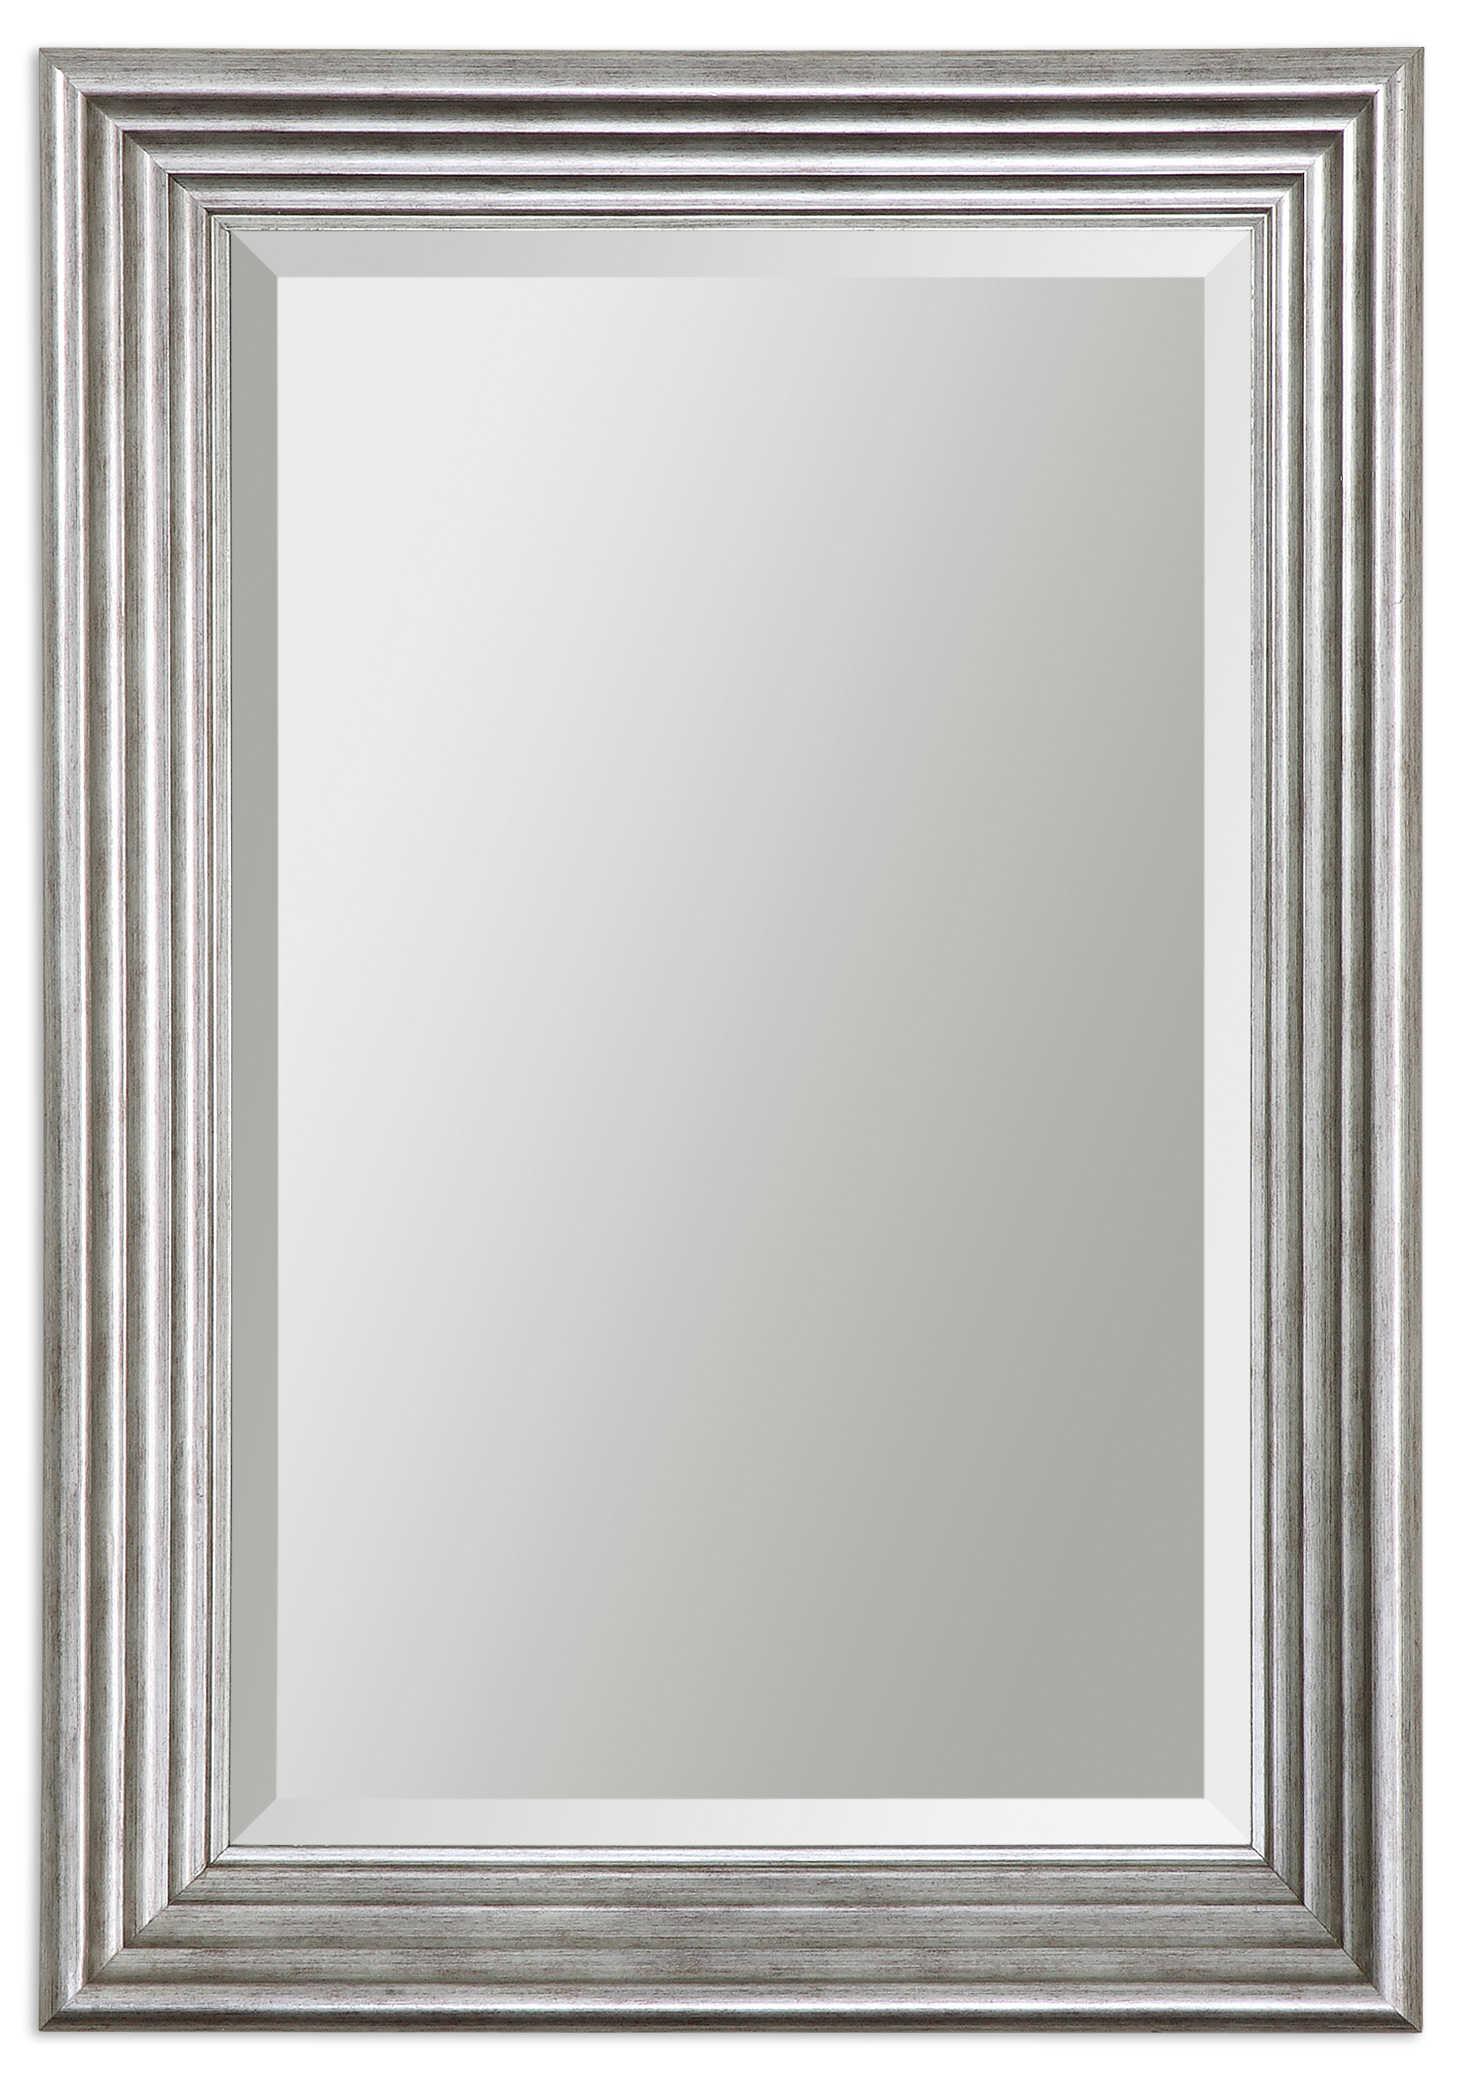 Latitude Mirror-$220.00